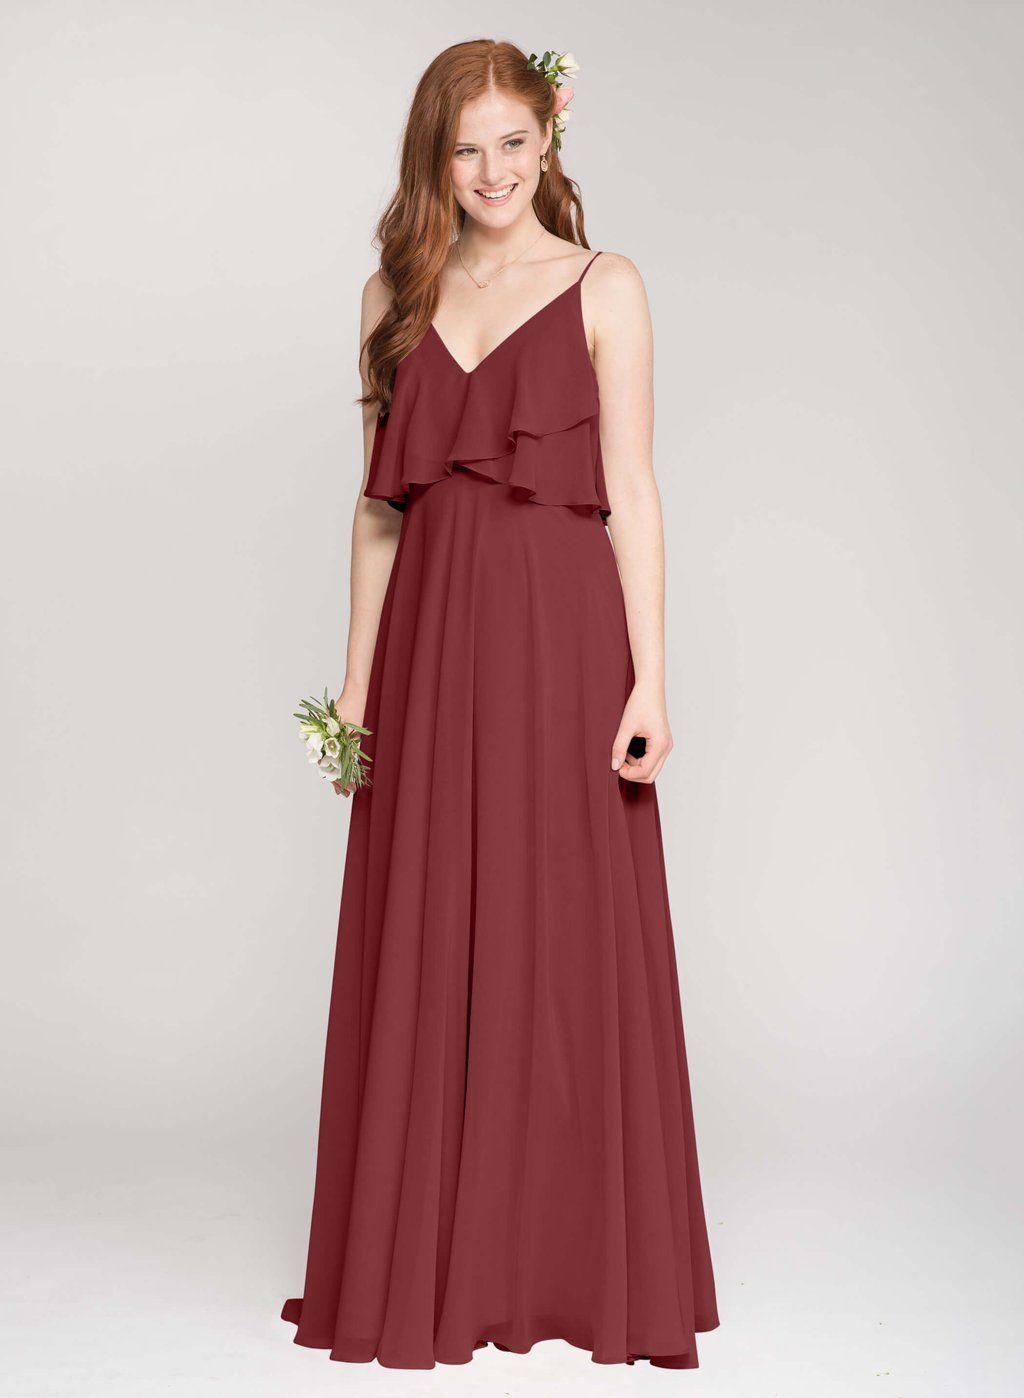 Seraphina dress wedding trends and weddings